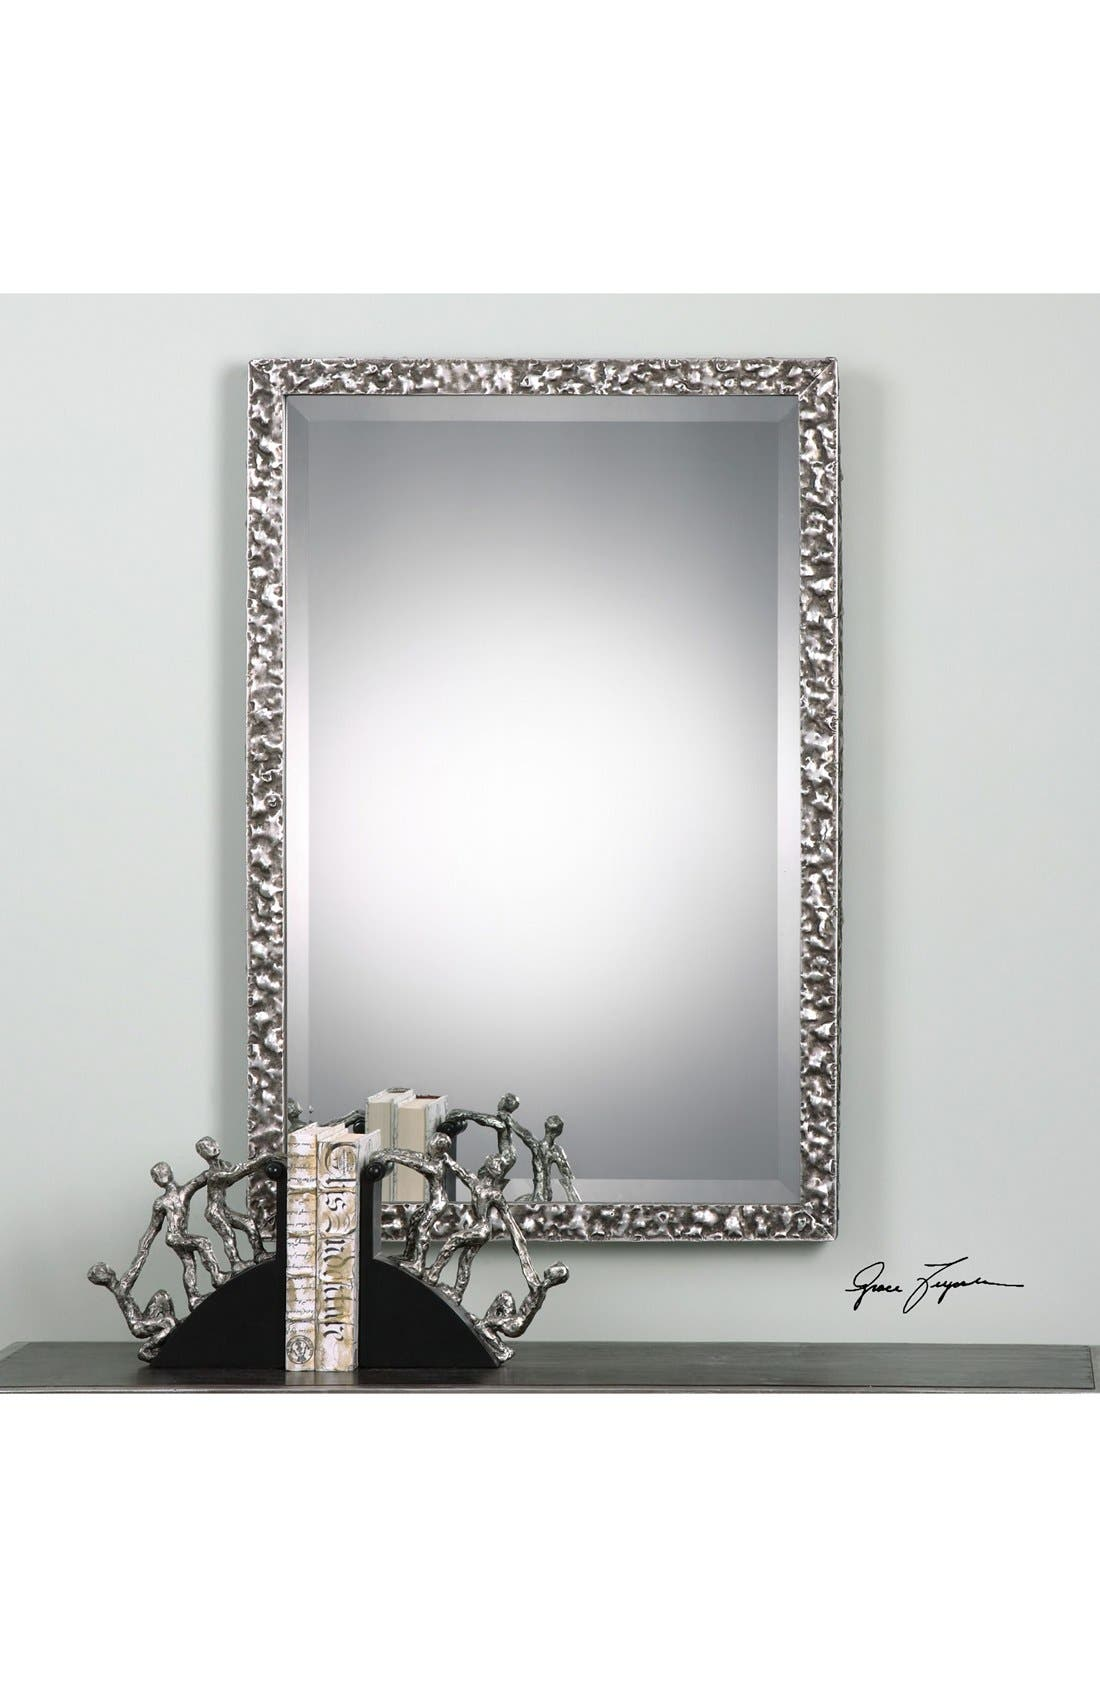 'Alshon' Rectangular Wall Mirror,                             Alternate thumbnail 2, color,                             020